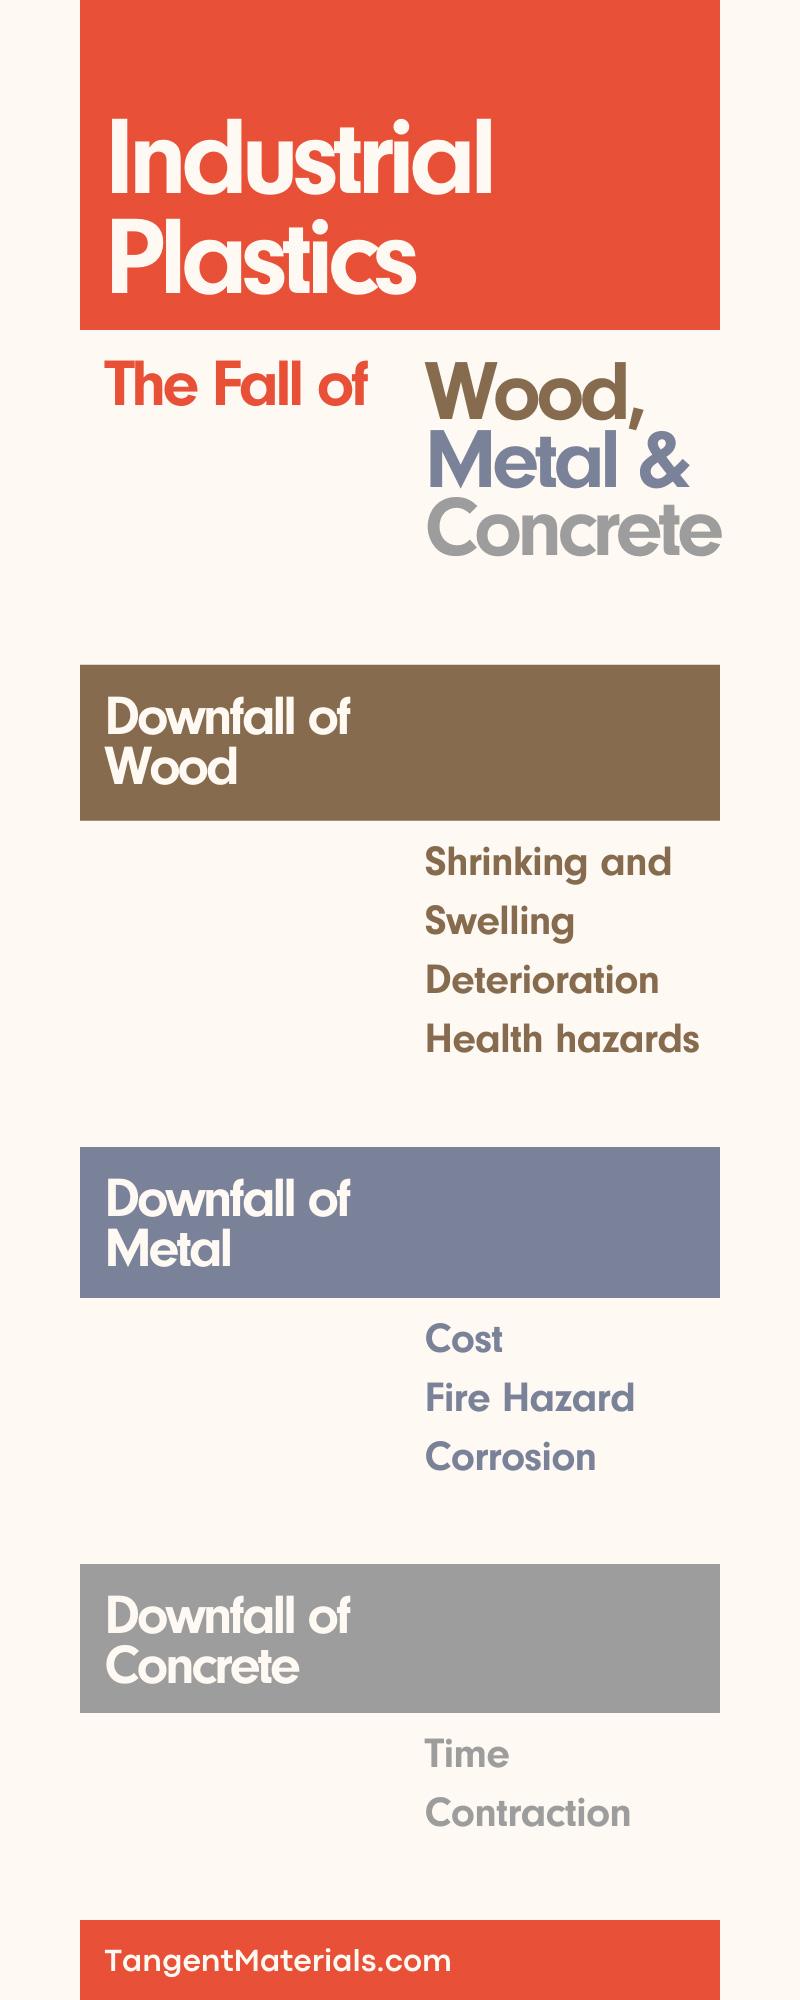 https://tangentmaterials.com/industrial-plastics-the-fall-of-wood-metal-concrete/